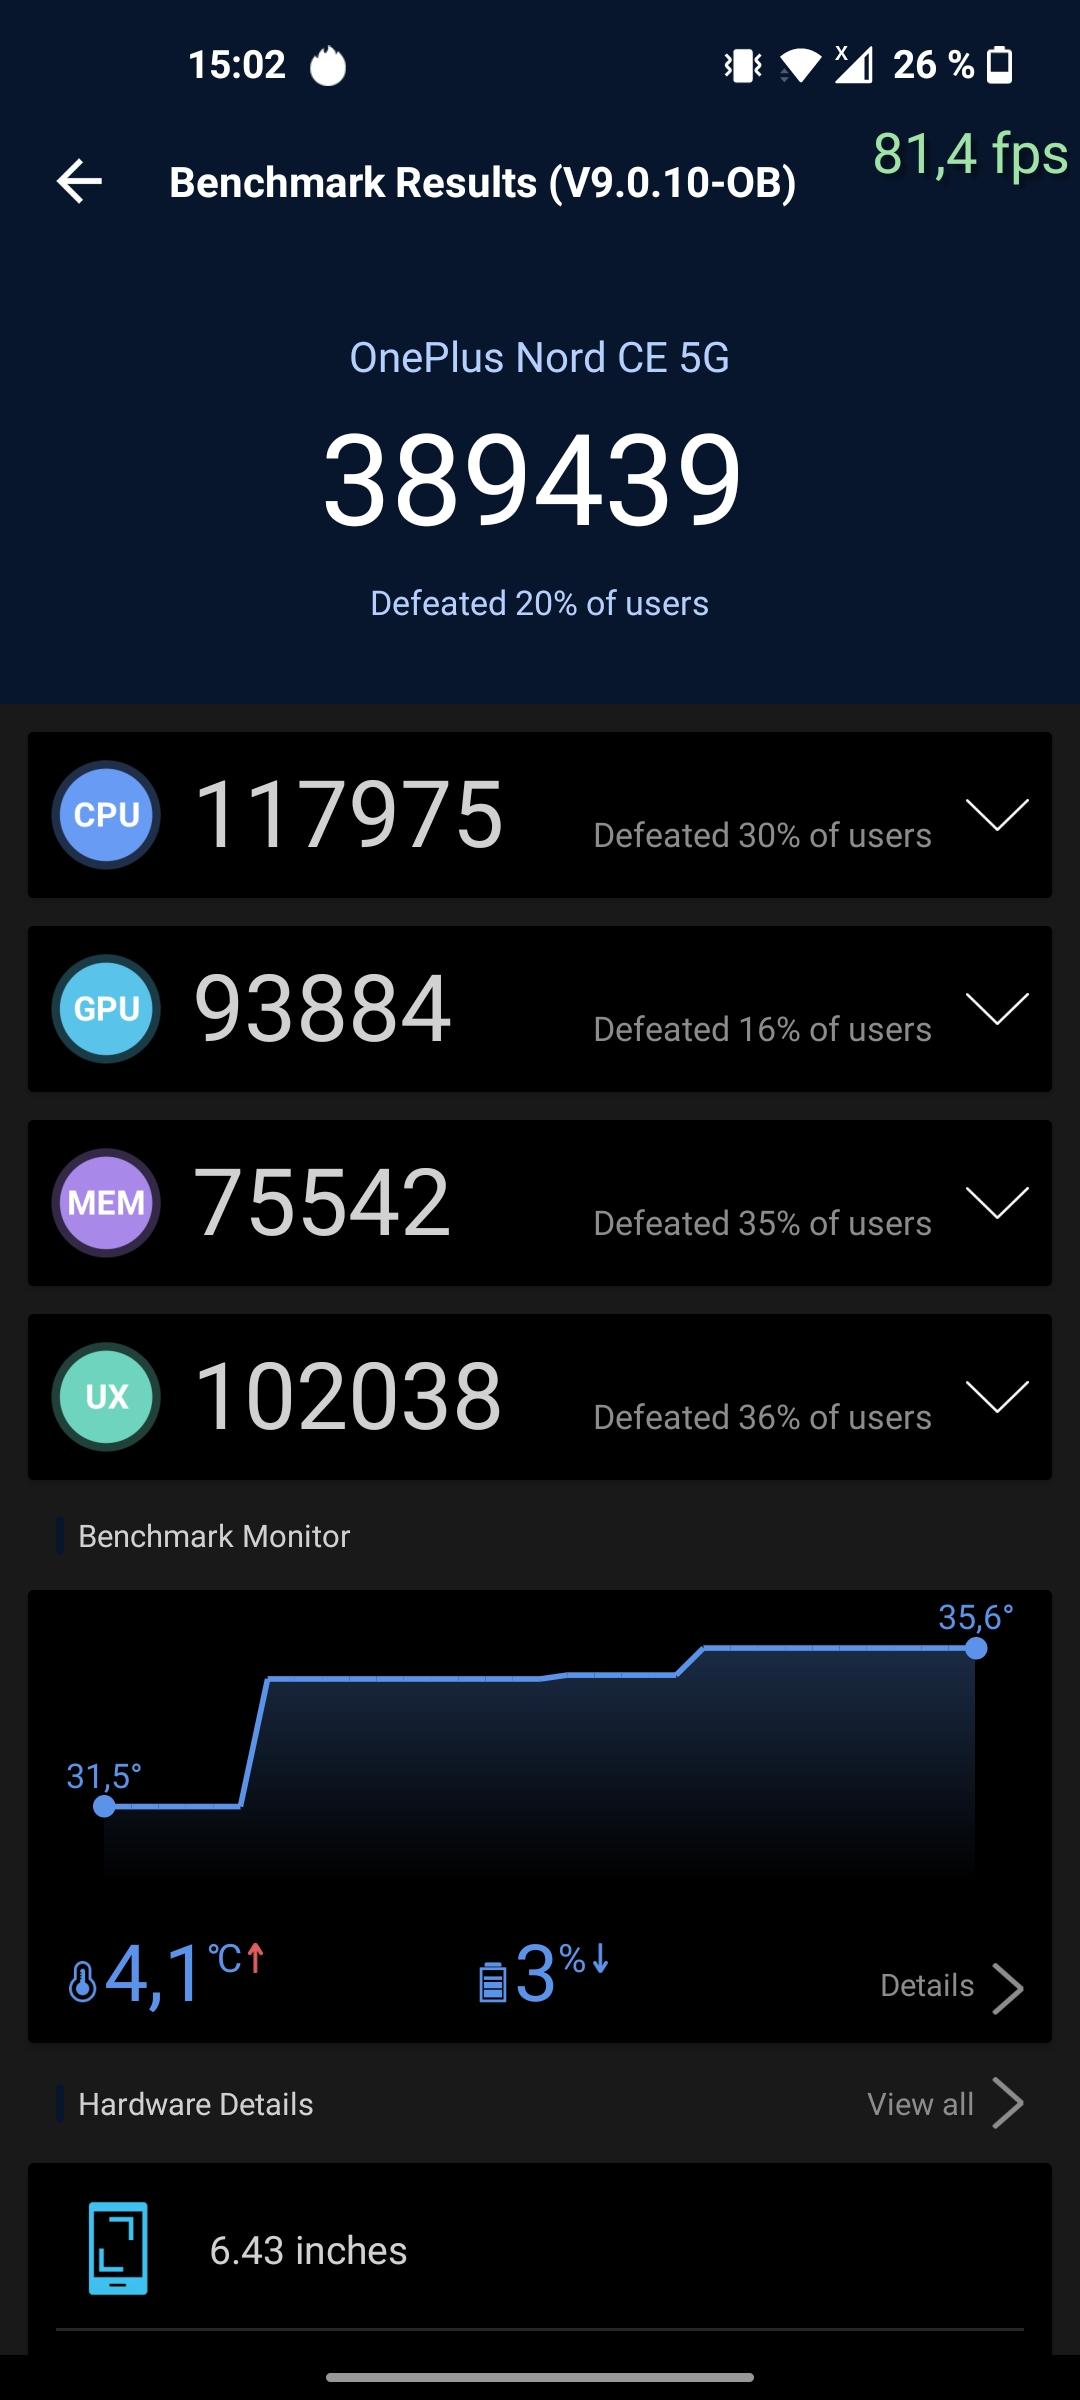 OnePlus Nord CE 5G Antutu